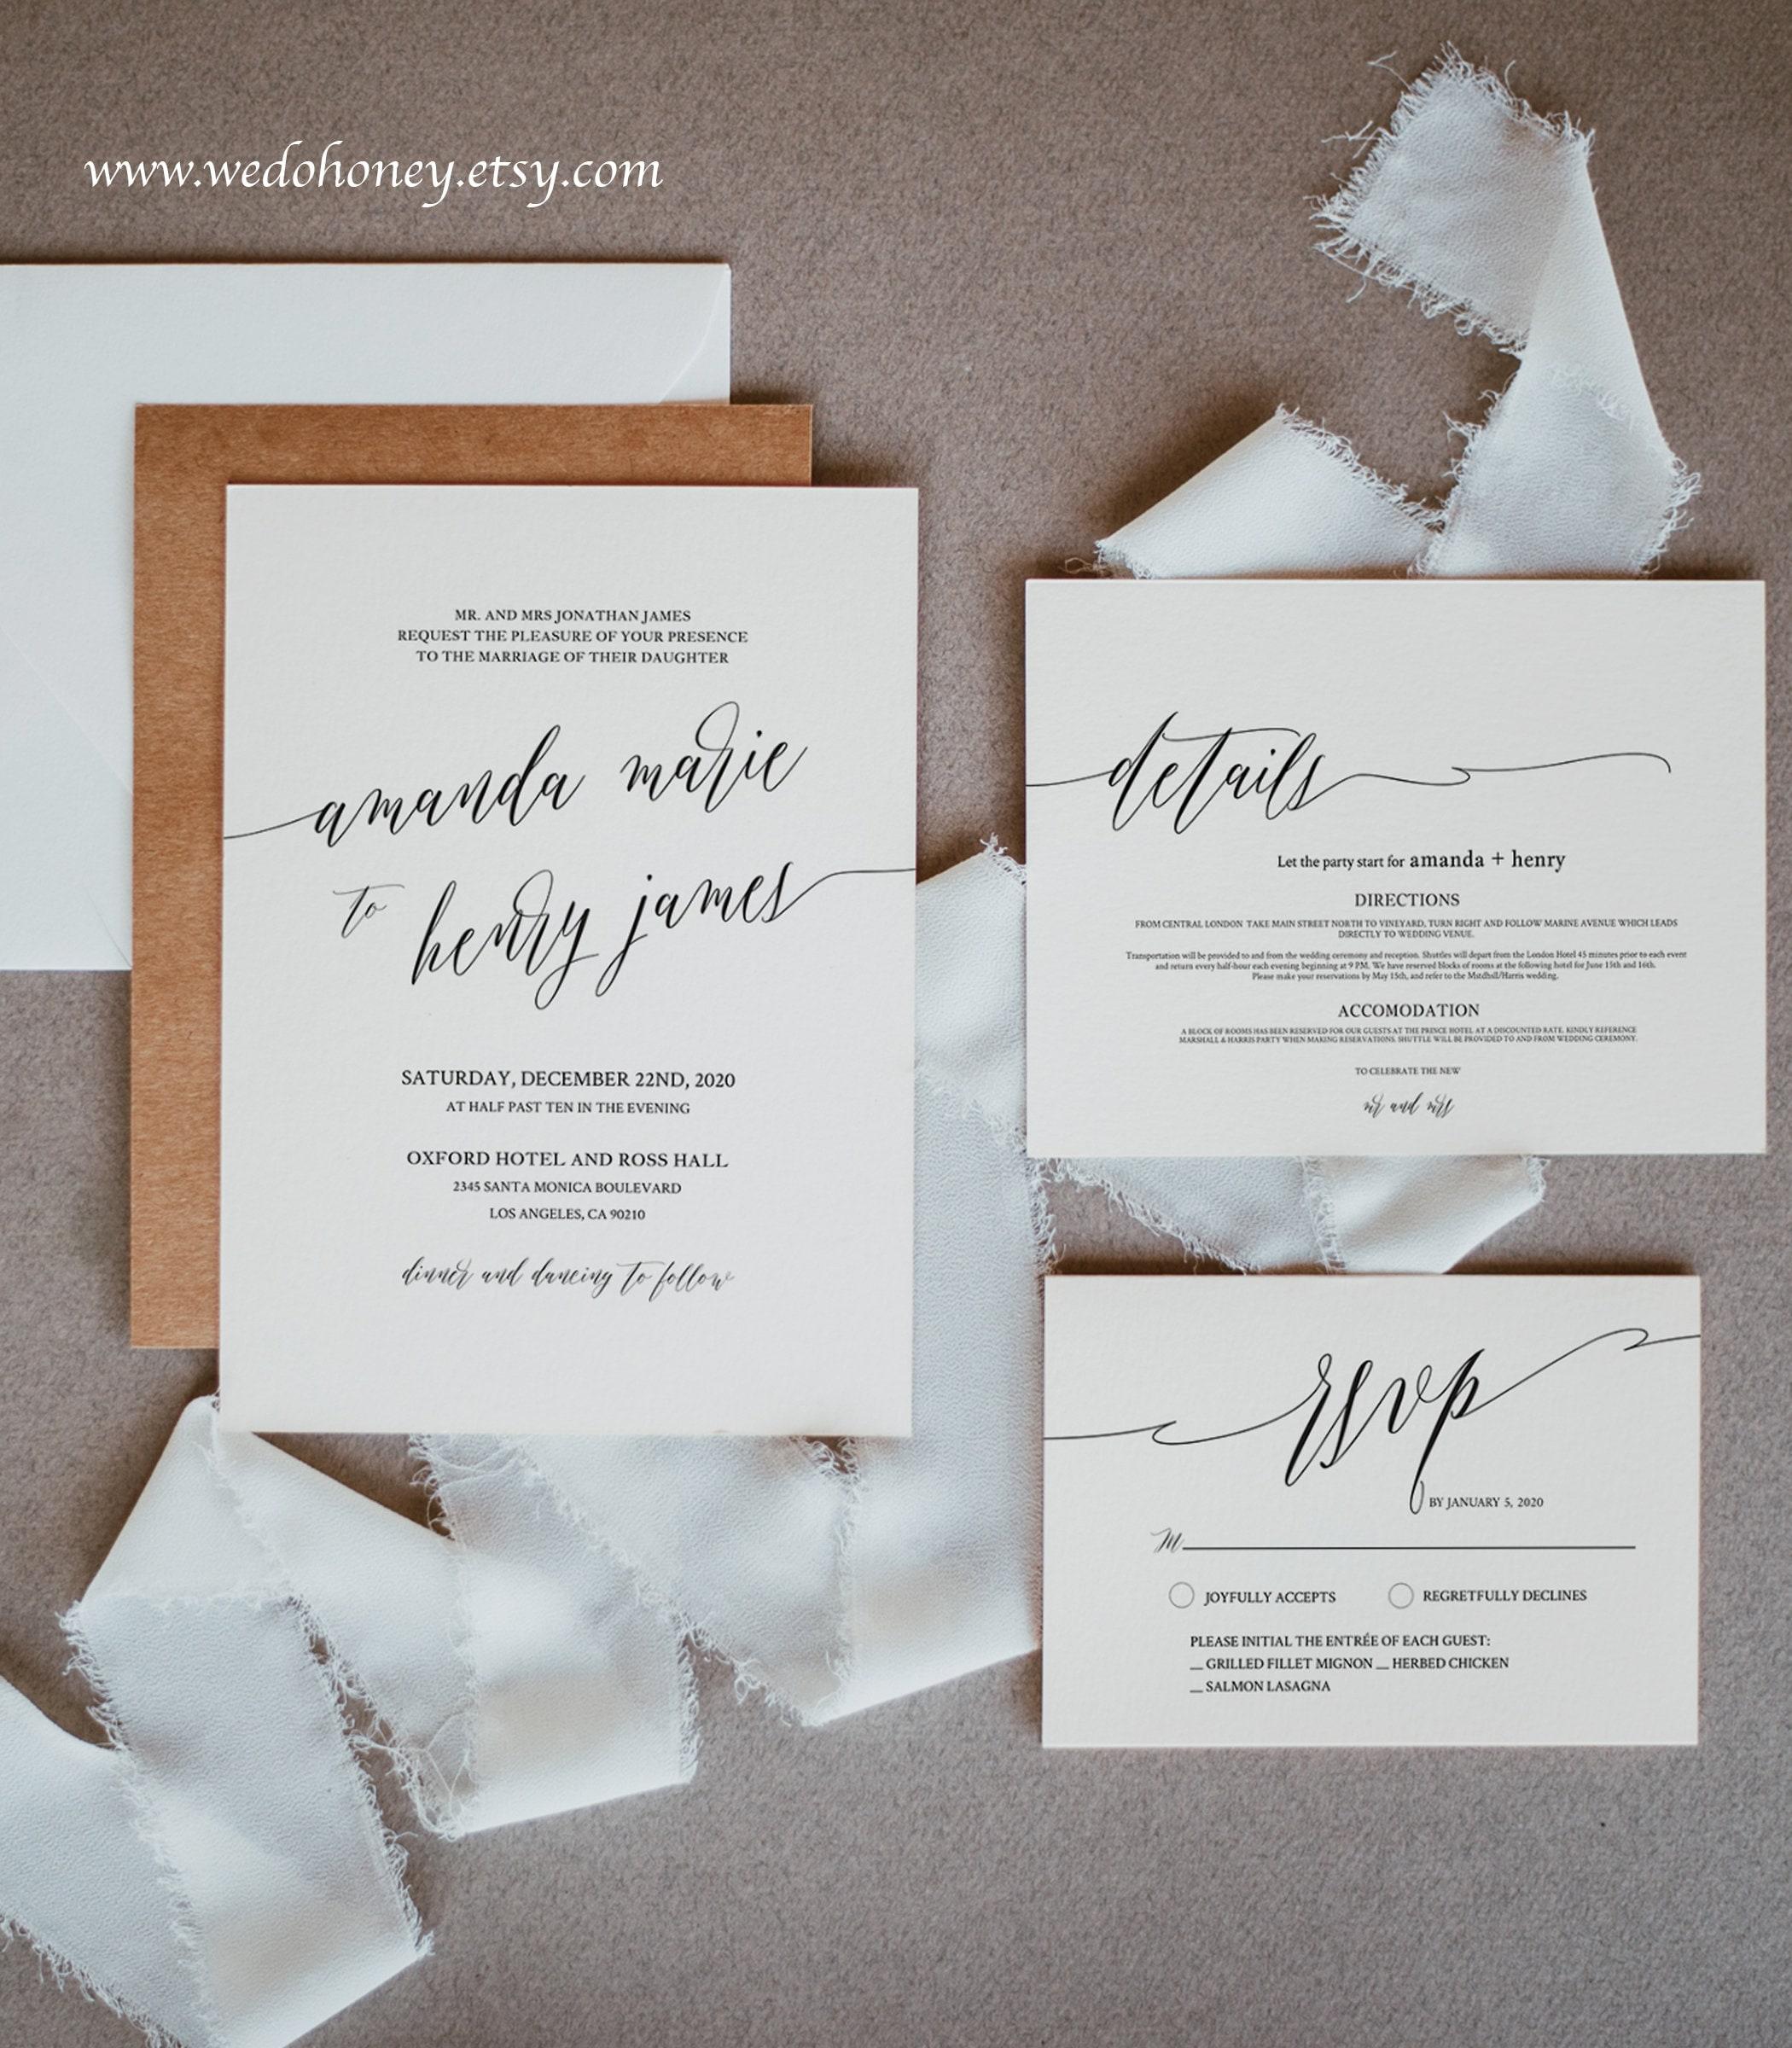 Calligraphy Wedding Suite Invitation Template, Minimalist, Modern and Elegant Wedding, Editable Text with Corjl #025